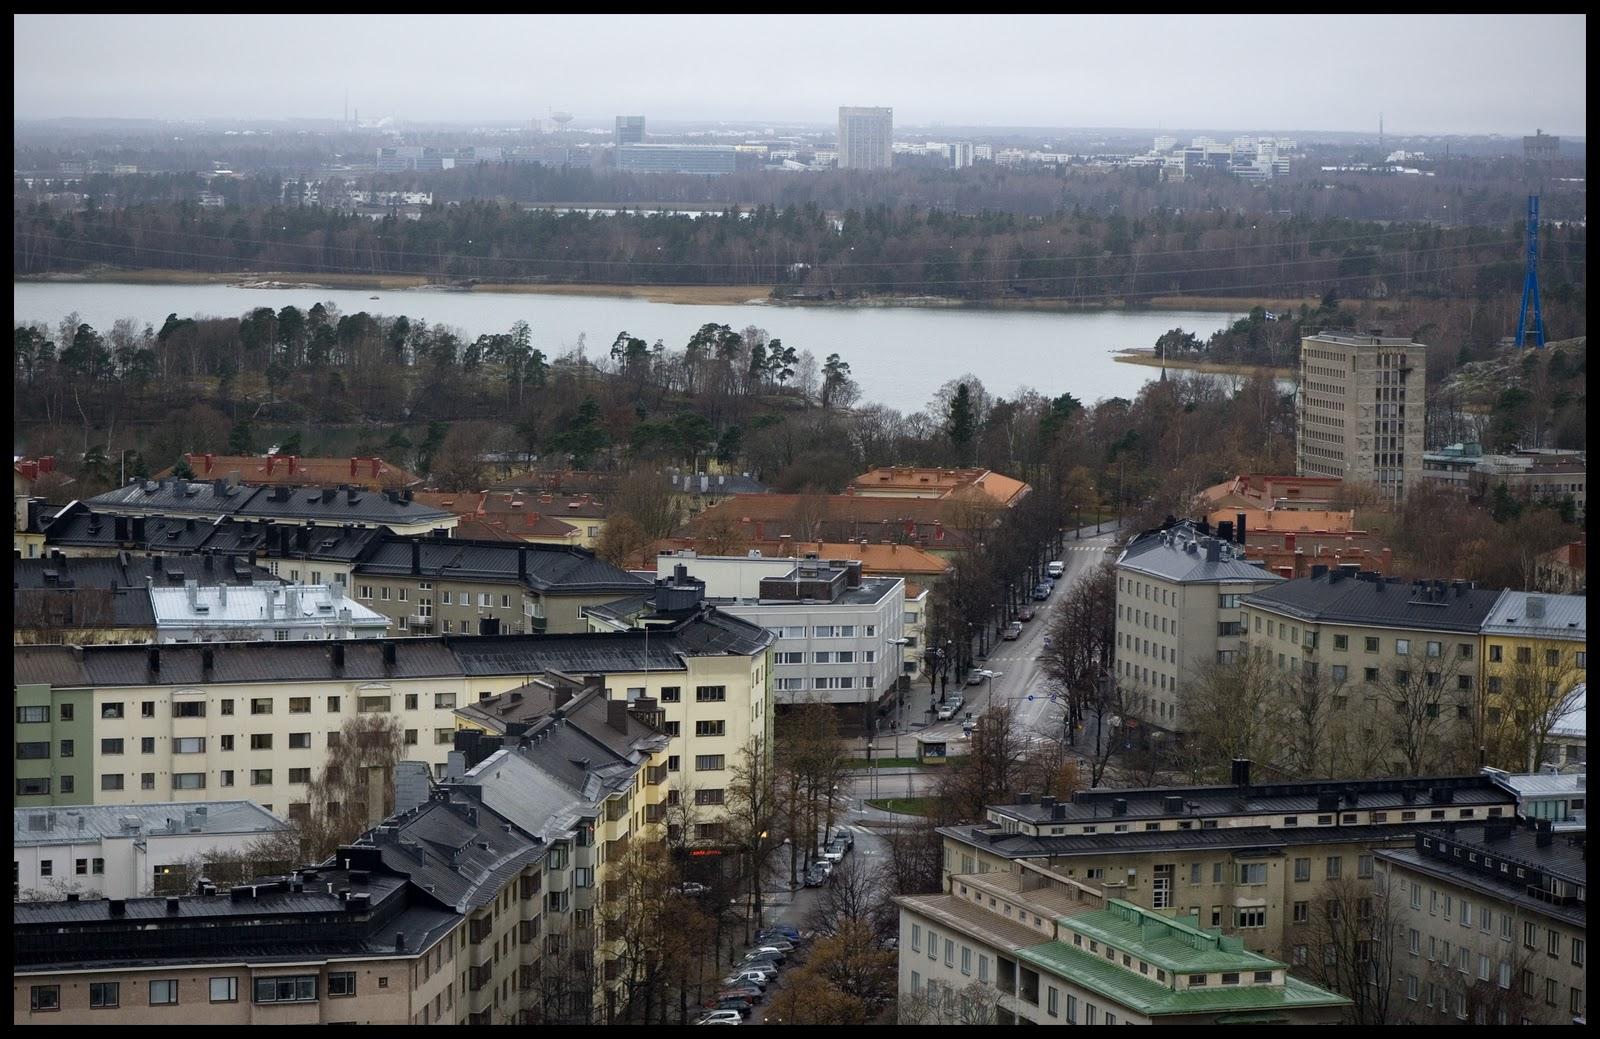 VALOKUVAUS: Helsinki 27.11.